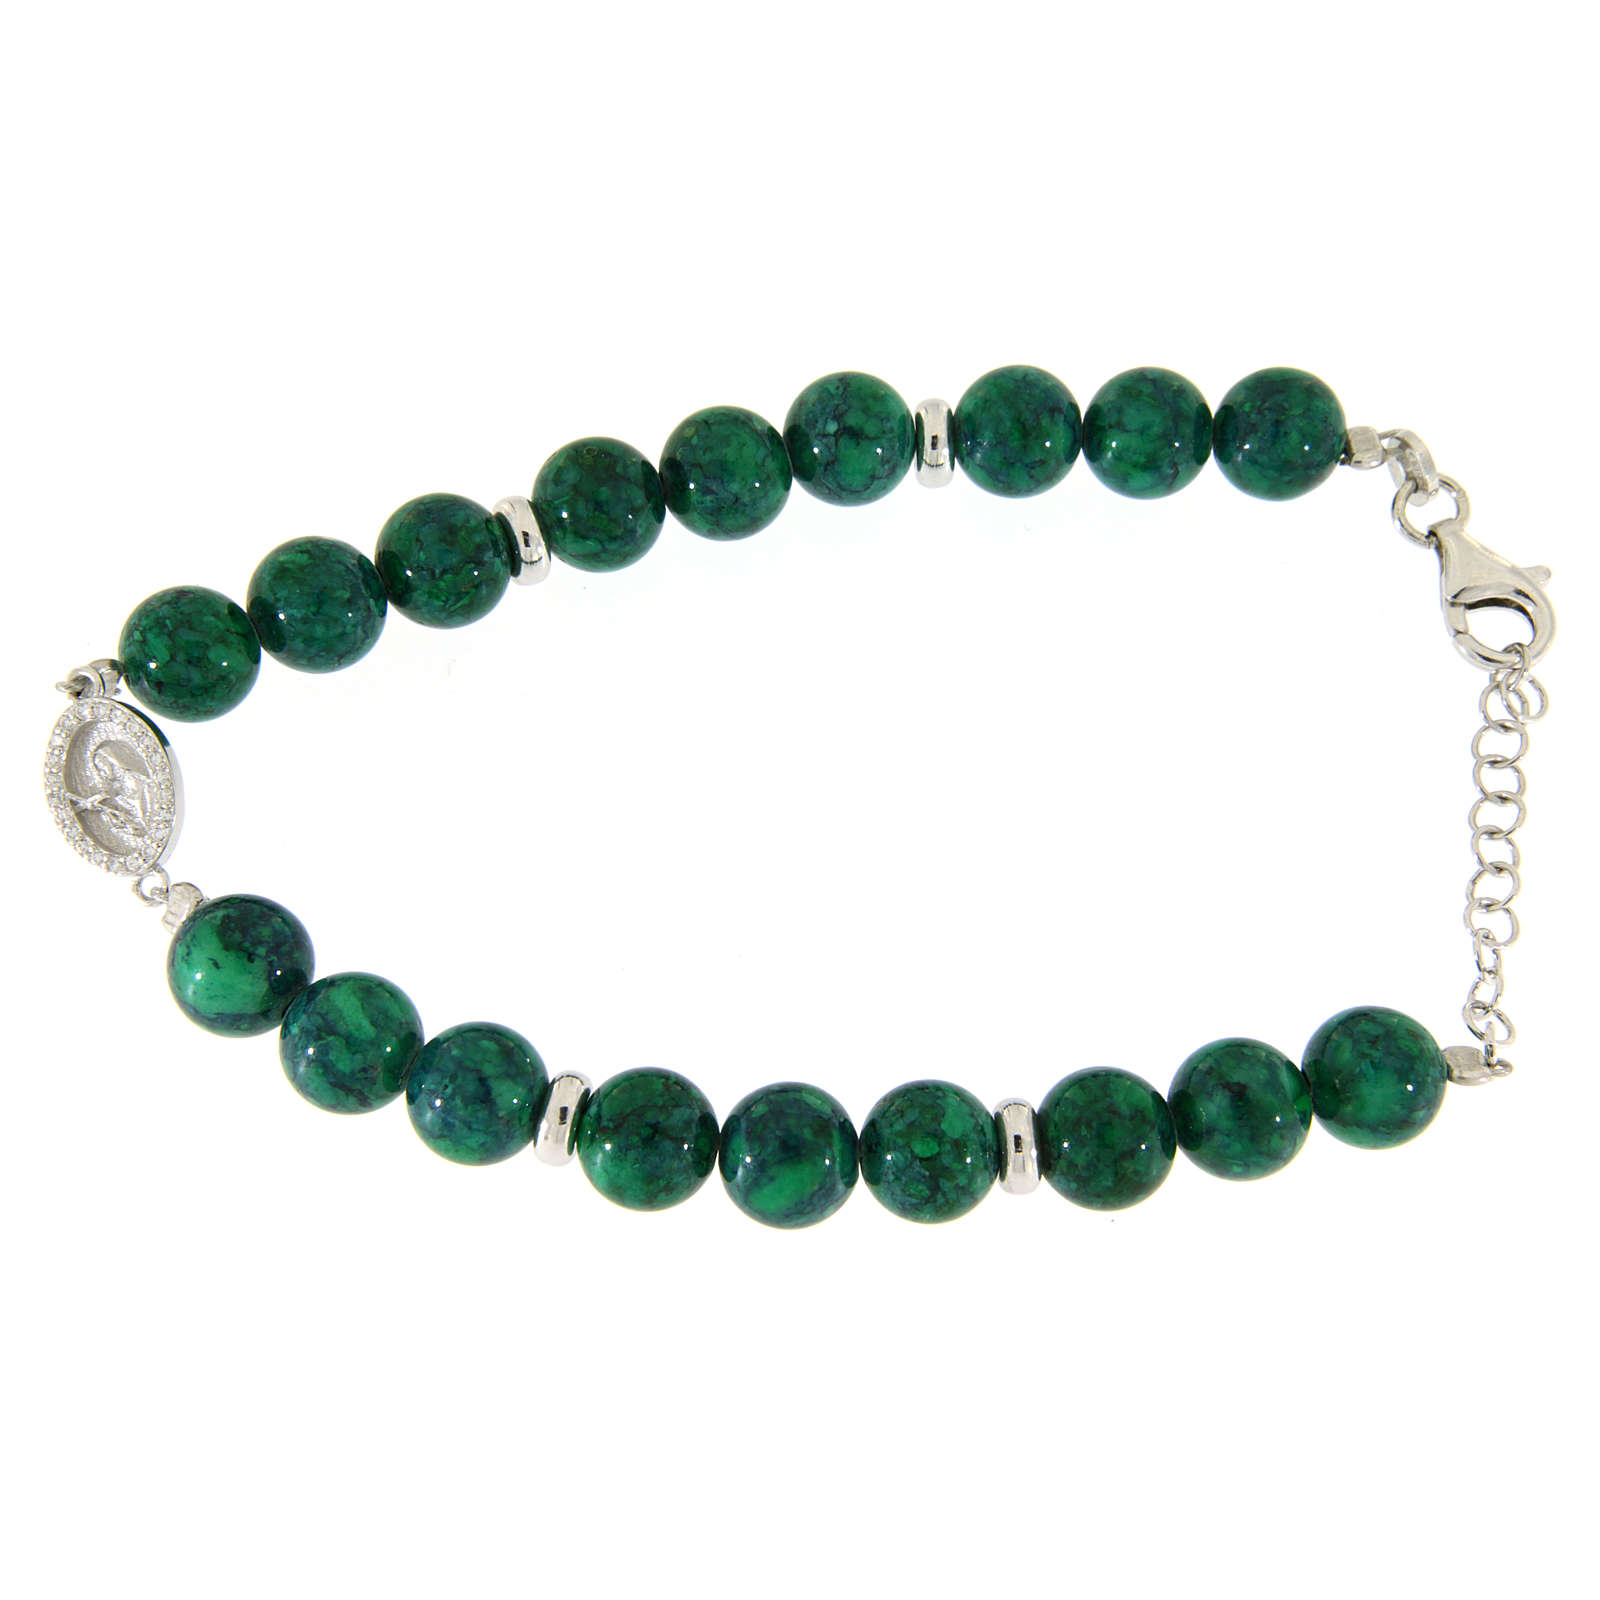 Bracciale argento, pietre dure resina verdi 7 mm, medaglietta S. Rita con zirconi bianchi 4